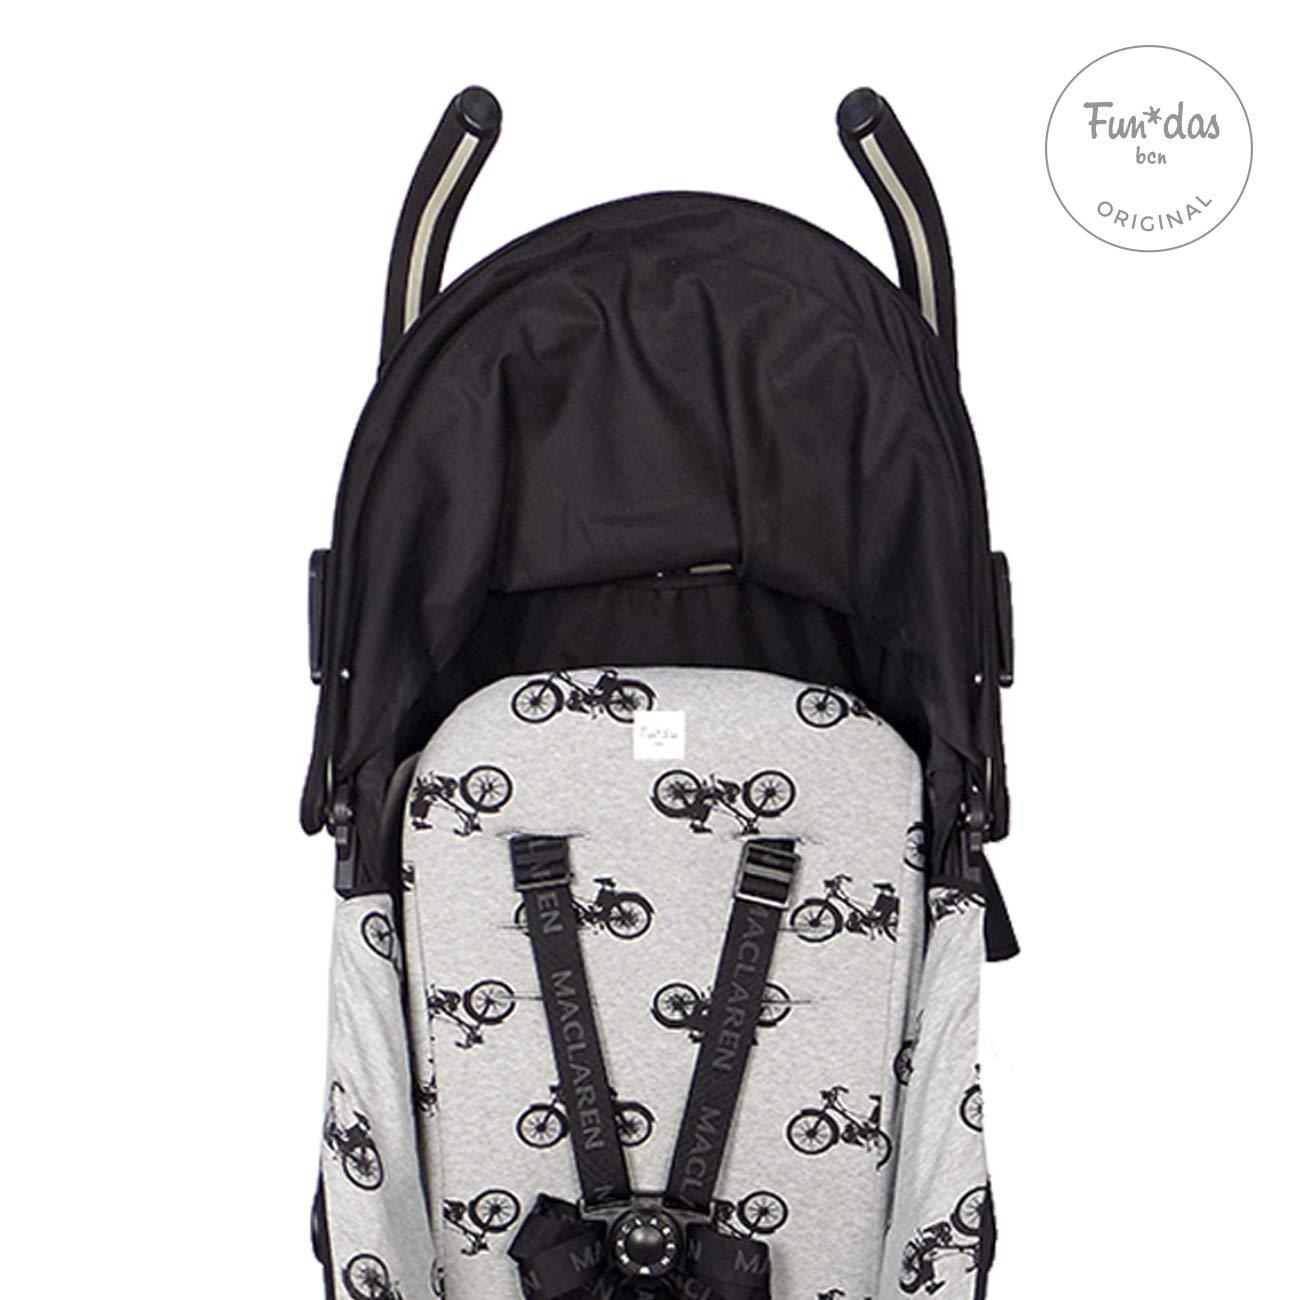 Colchoneta para silla de paseo Maclaren Quest /® 2013-17 Fundas BCN /® Black Bikes F95//93e99b